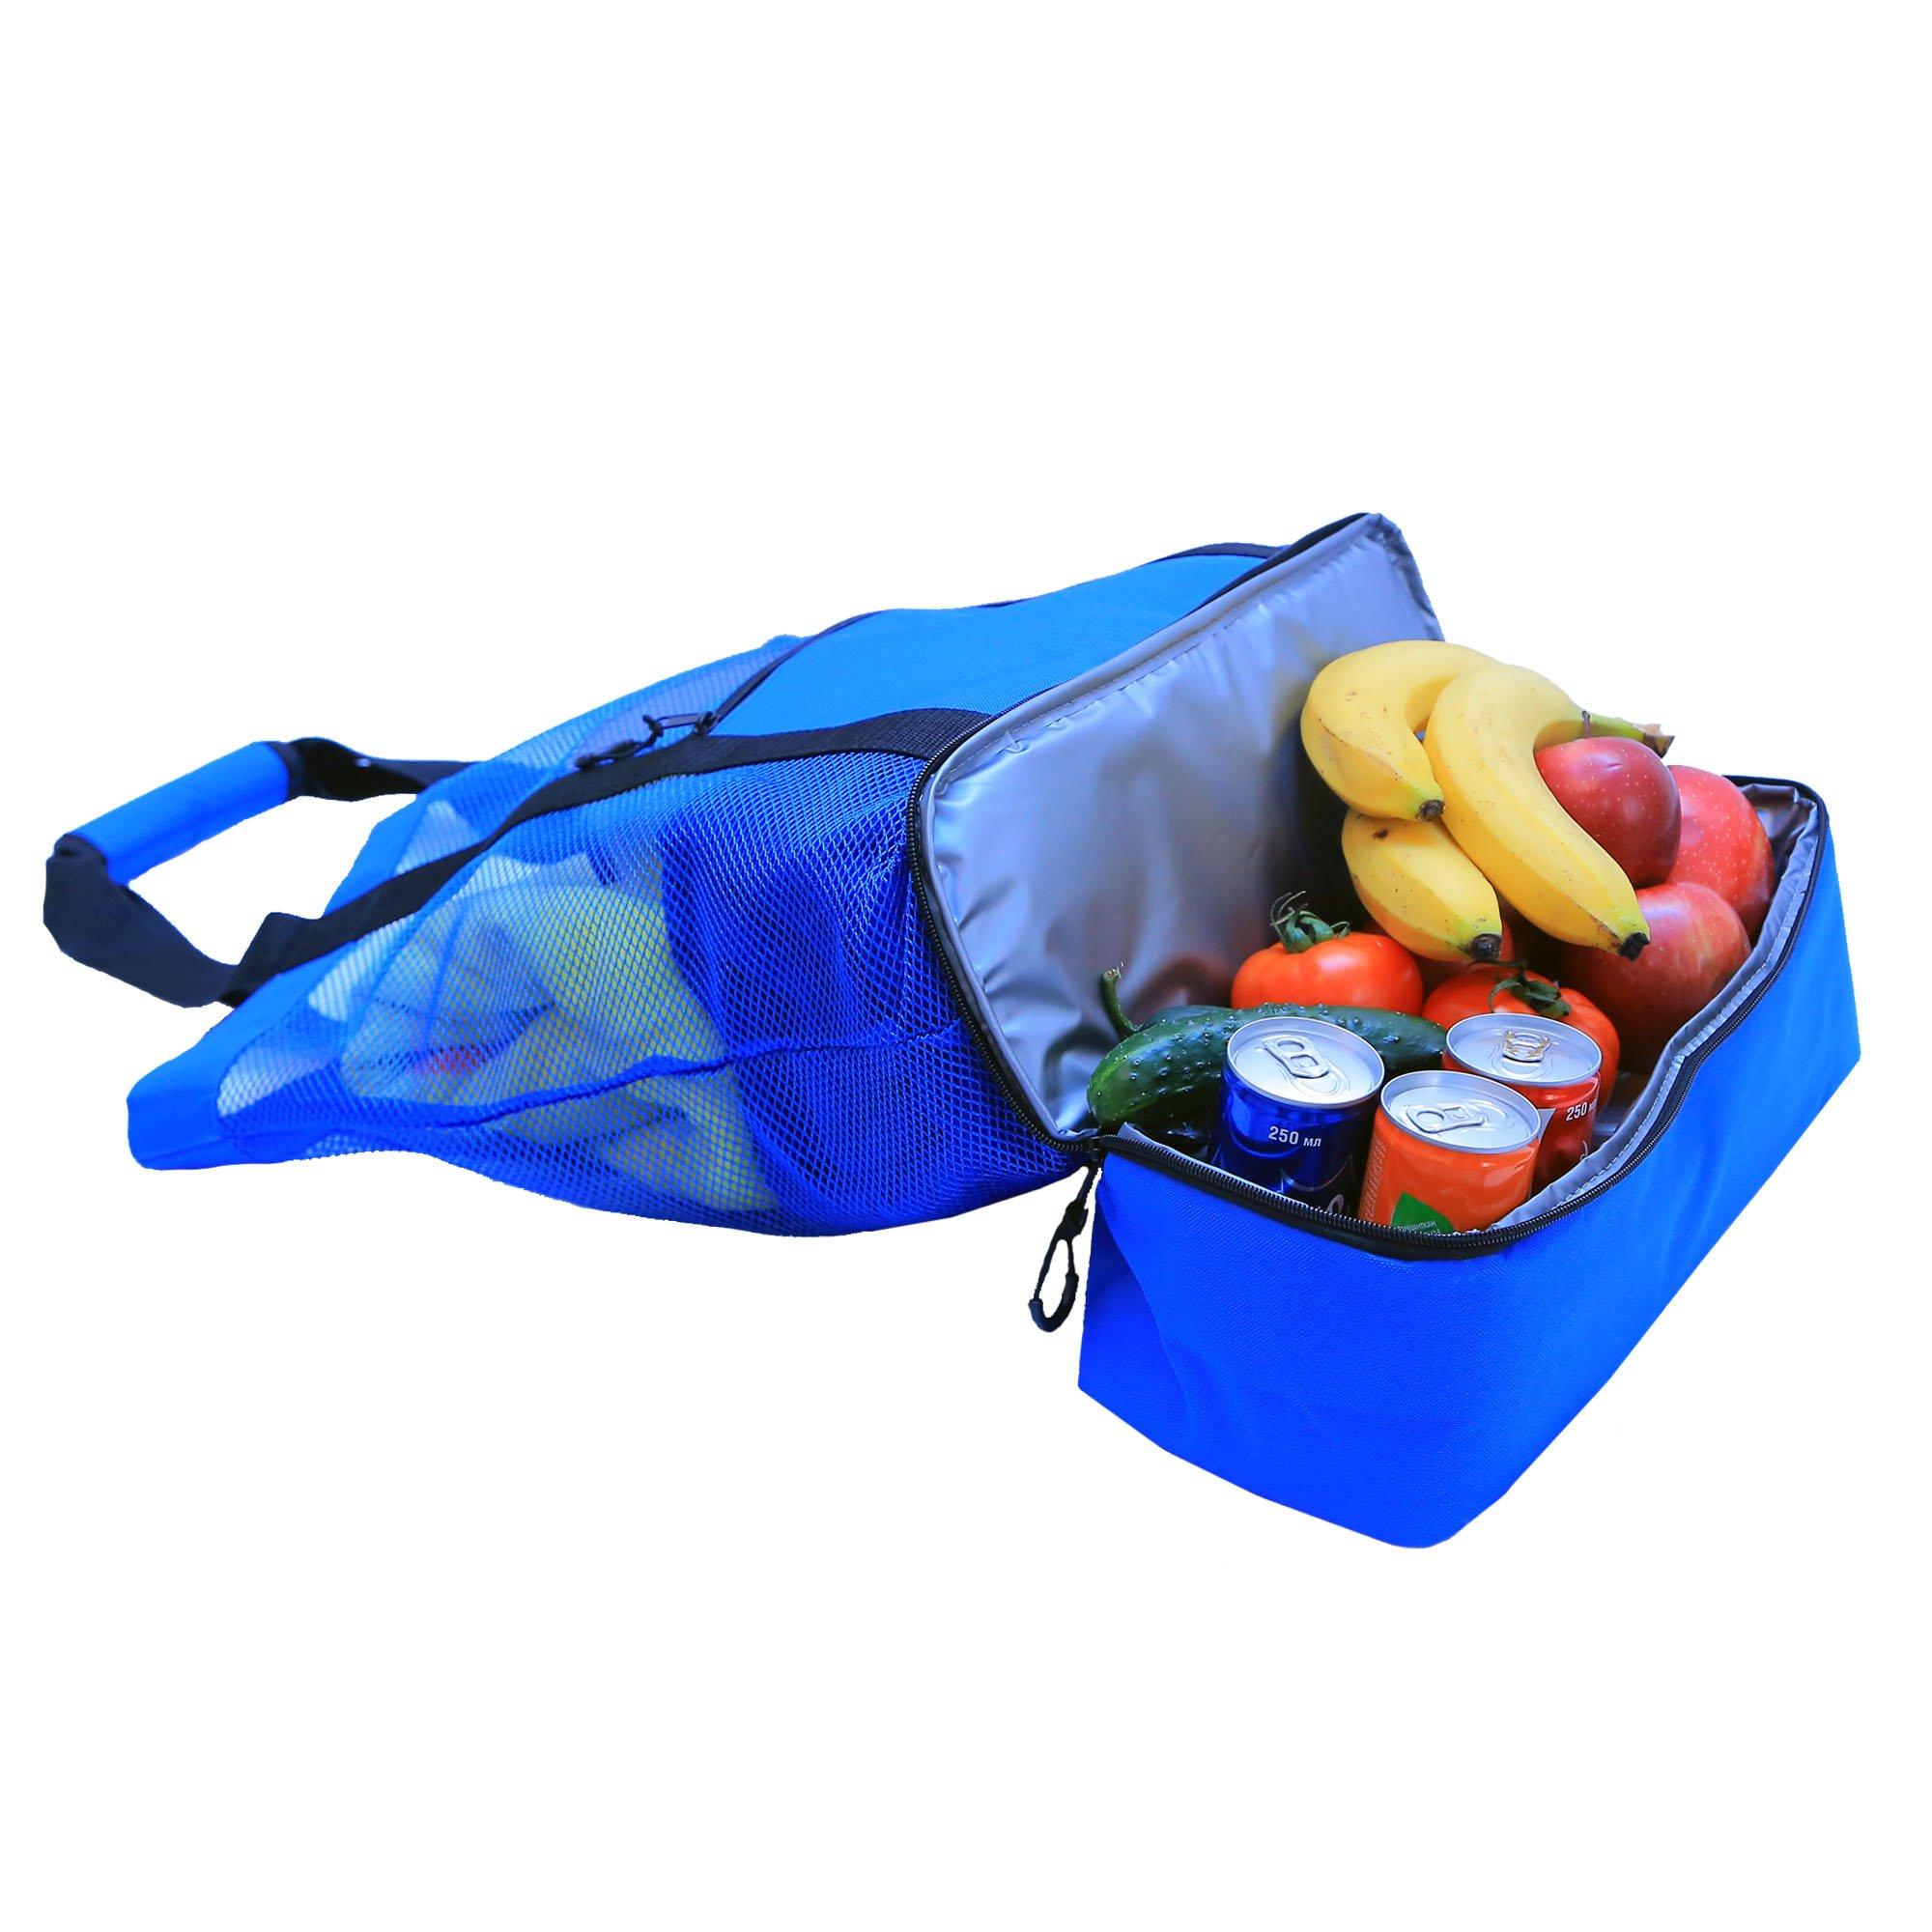 JU&JI's Beach Tote Bags – 2-in-1 Design – Mesh Bag & Built-in Picnic Cooler Compartment – Big or Extra Large Cooler Beach Bags – Padded Handle, Waterproof Zipper & Heavy-Duty Build by Ju&Ji (Image #4)